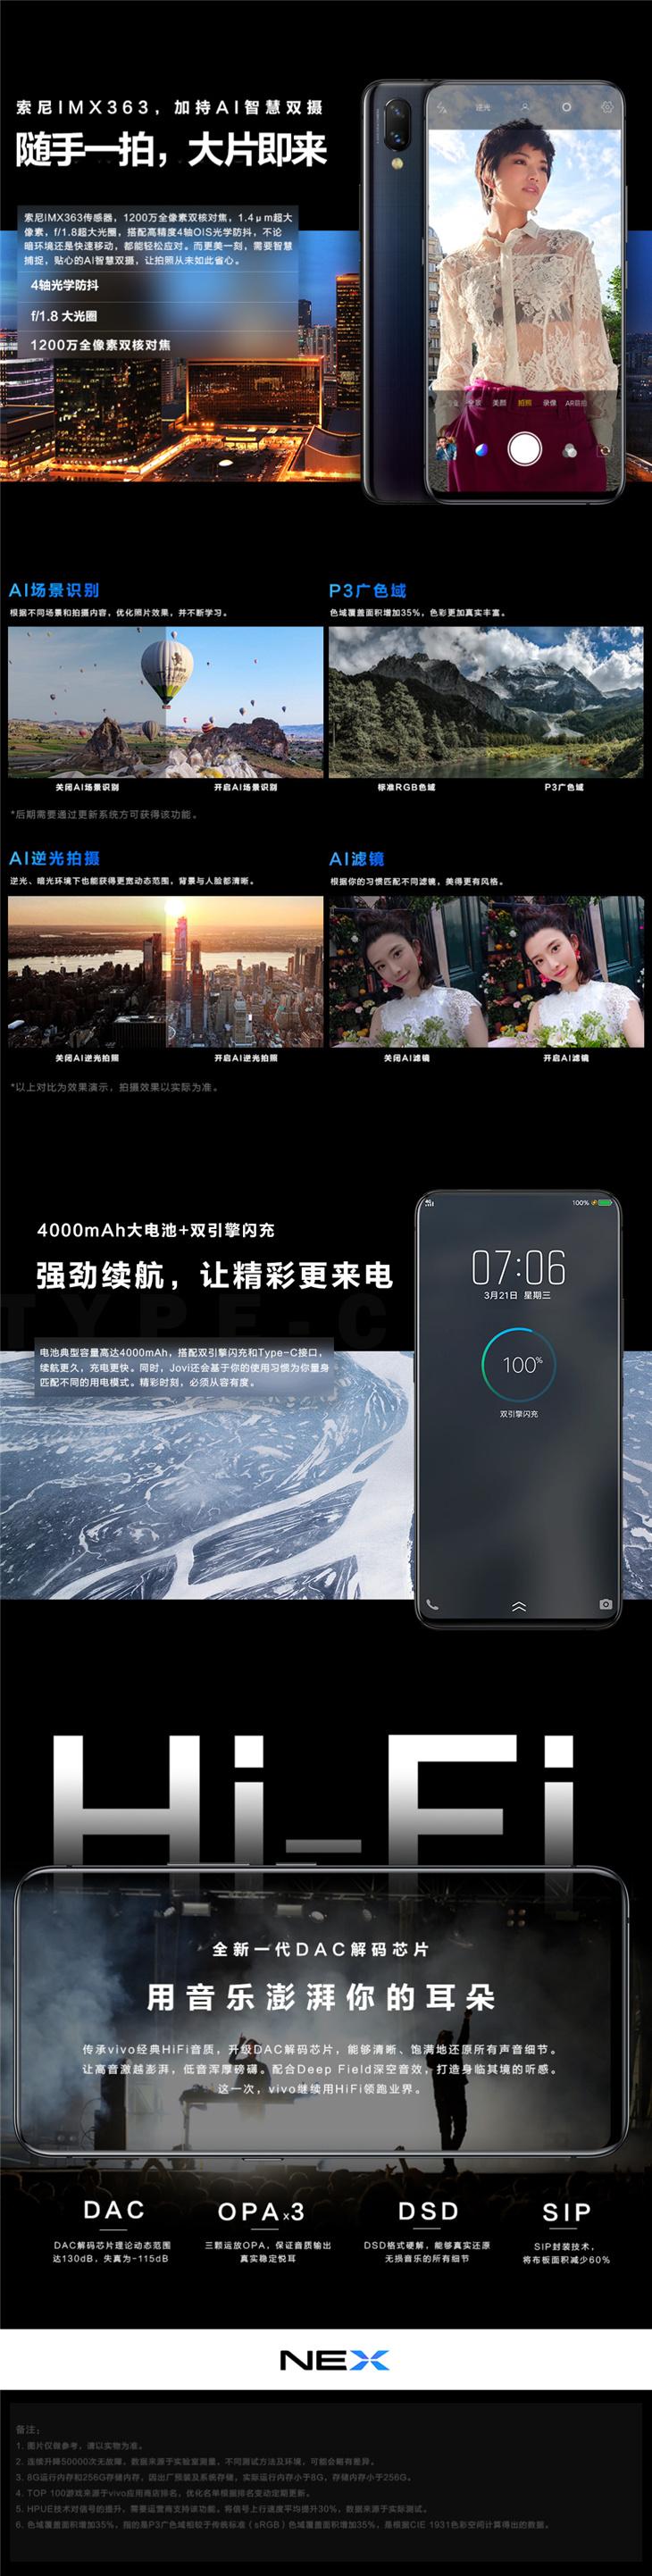 vivo NEX旗舰版手机免费试用,评测